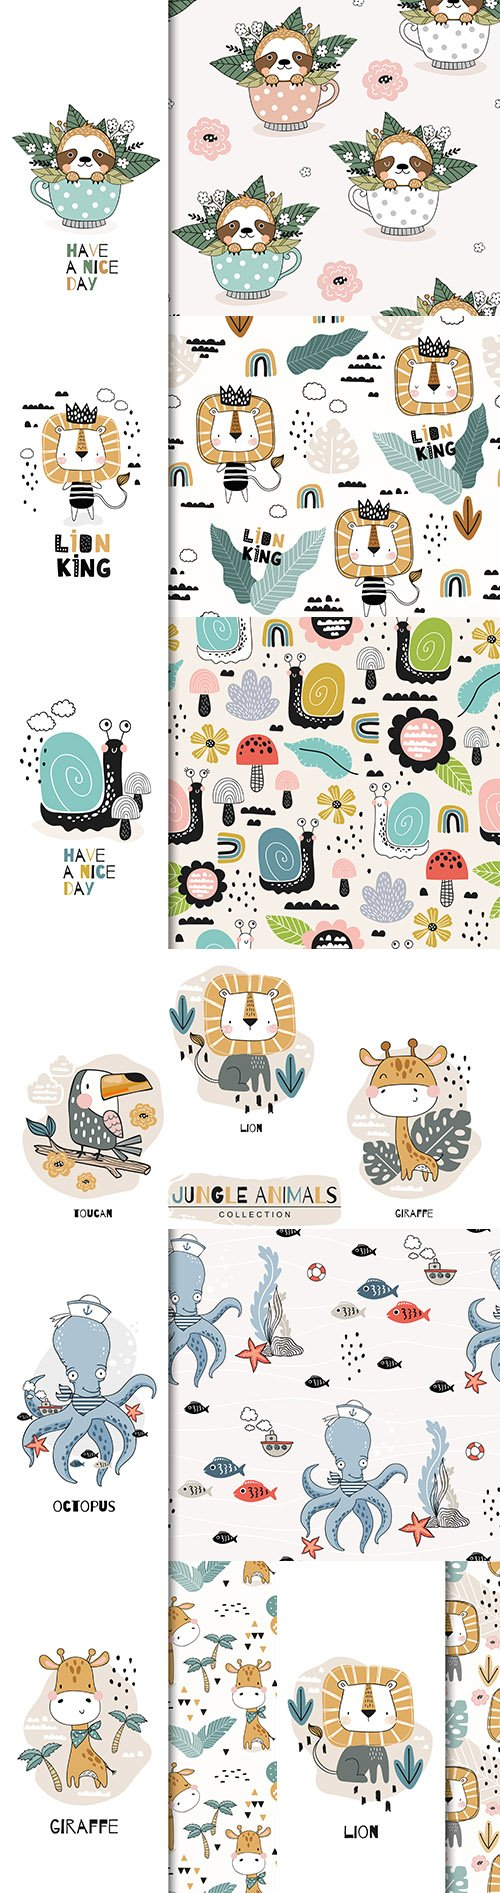 Cartoon cute animal characters seamless design illustration